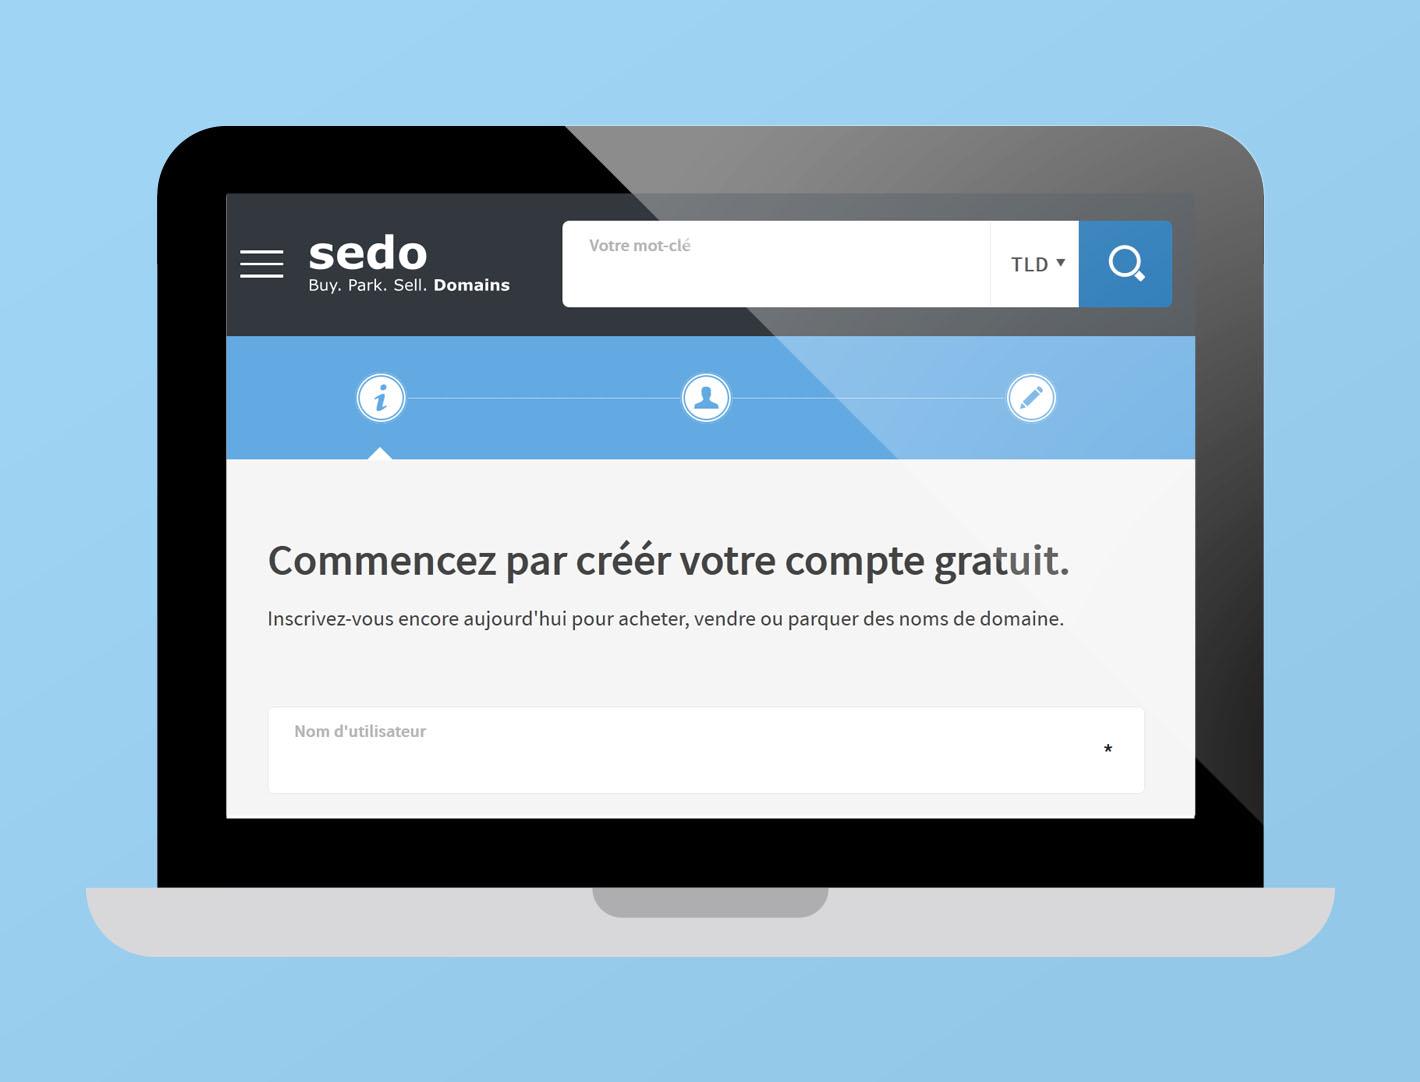 SEDO achat-vente domaines - WWW IMRITECHSEARCH COM